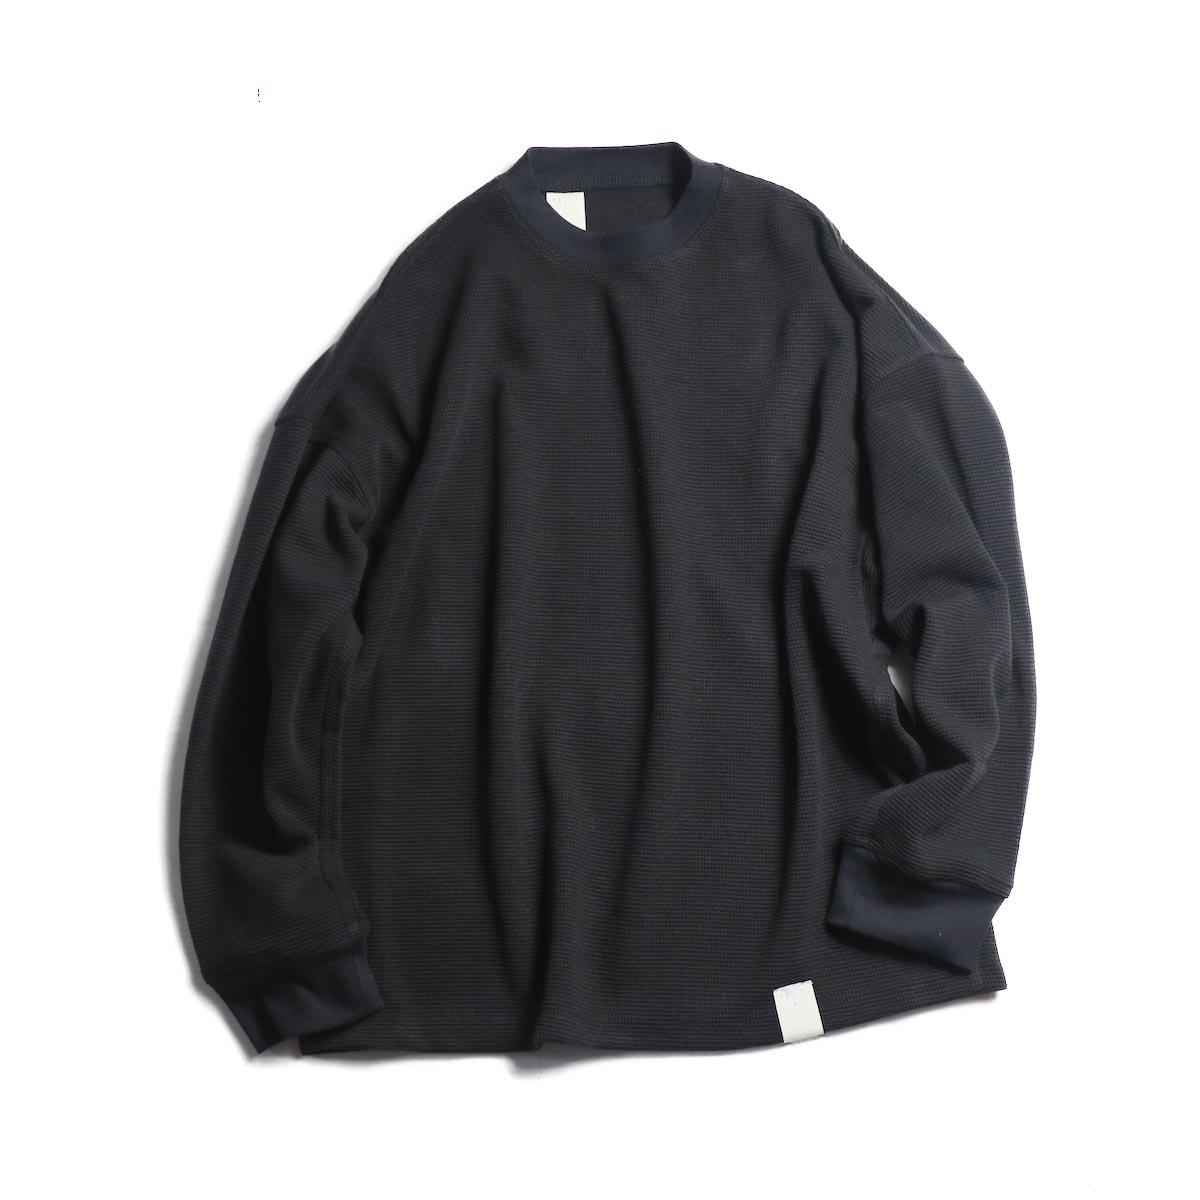 N.HOOLYWOOD / 182-CS07-013-pieces WAFFLE SWEAT CUT SEW  -Black